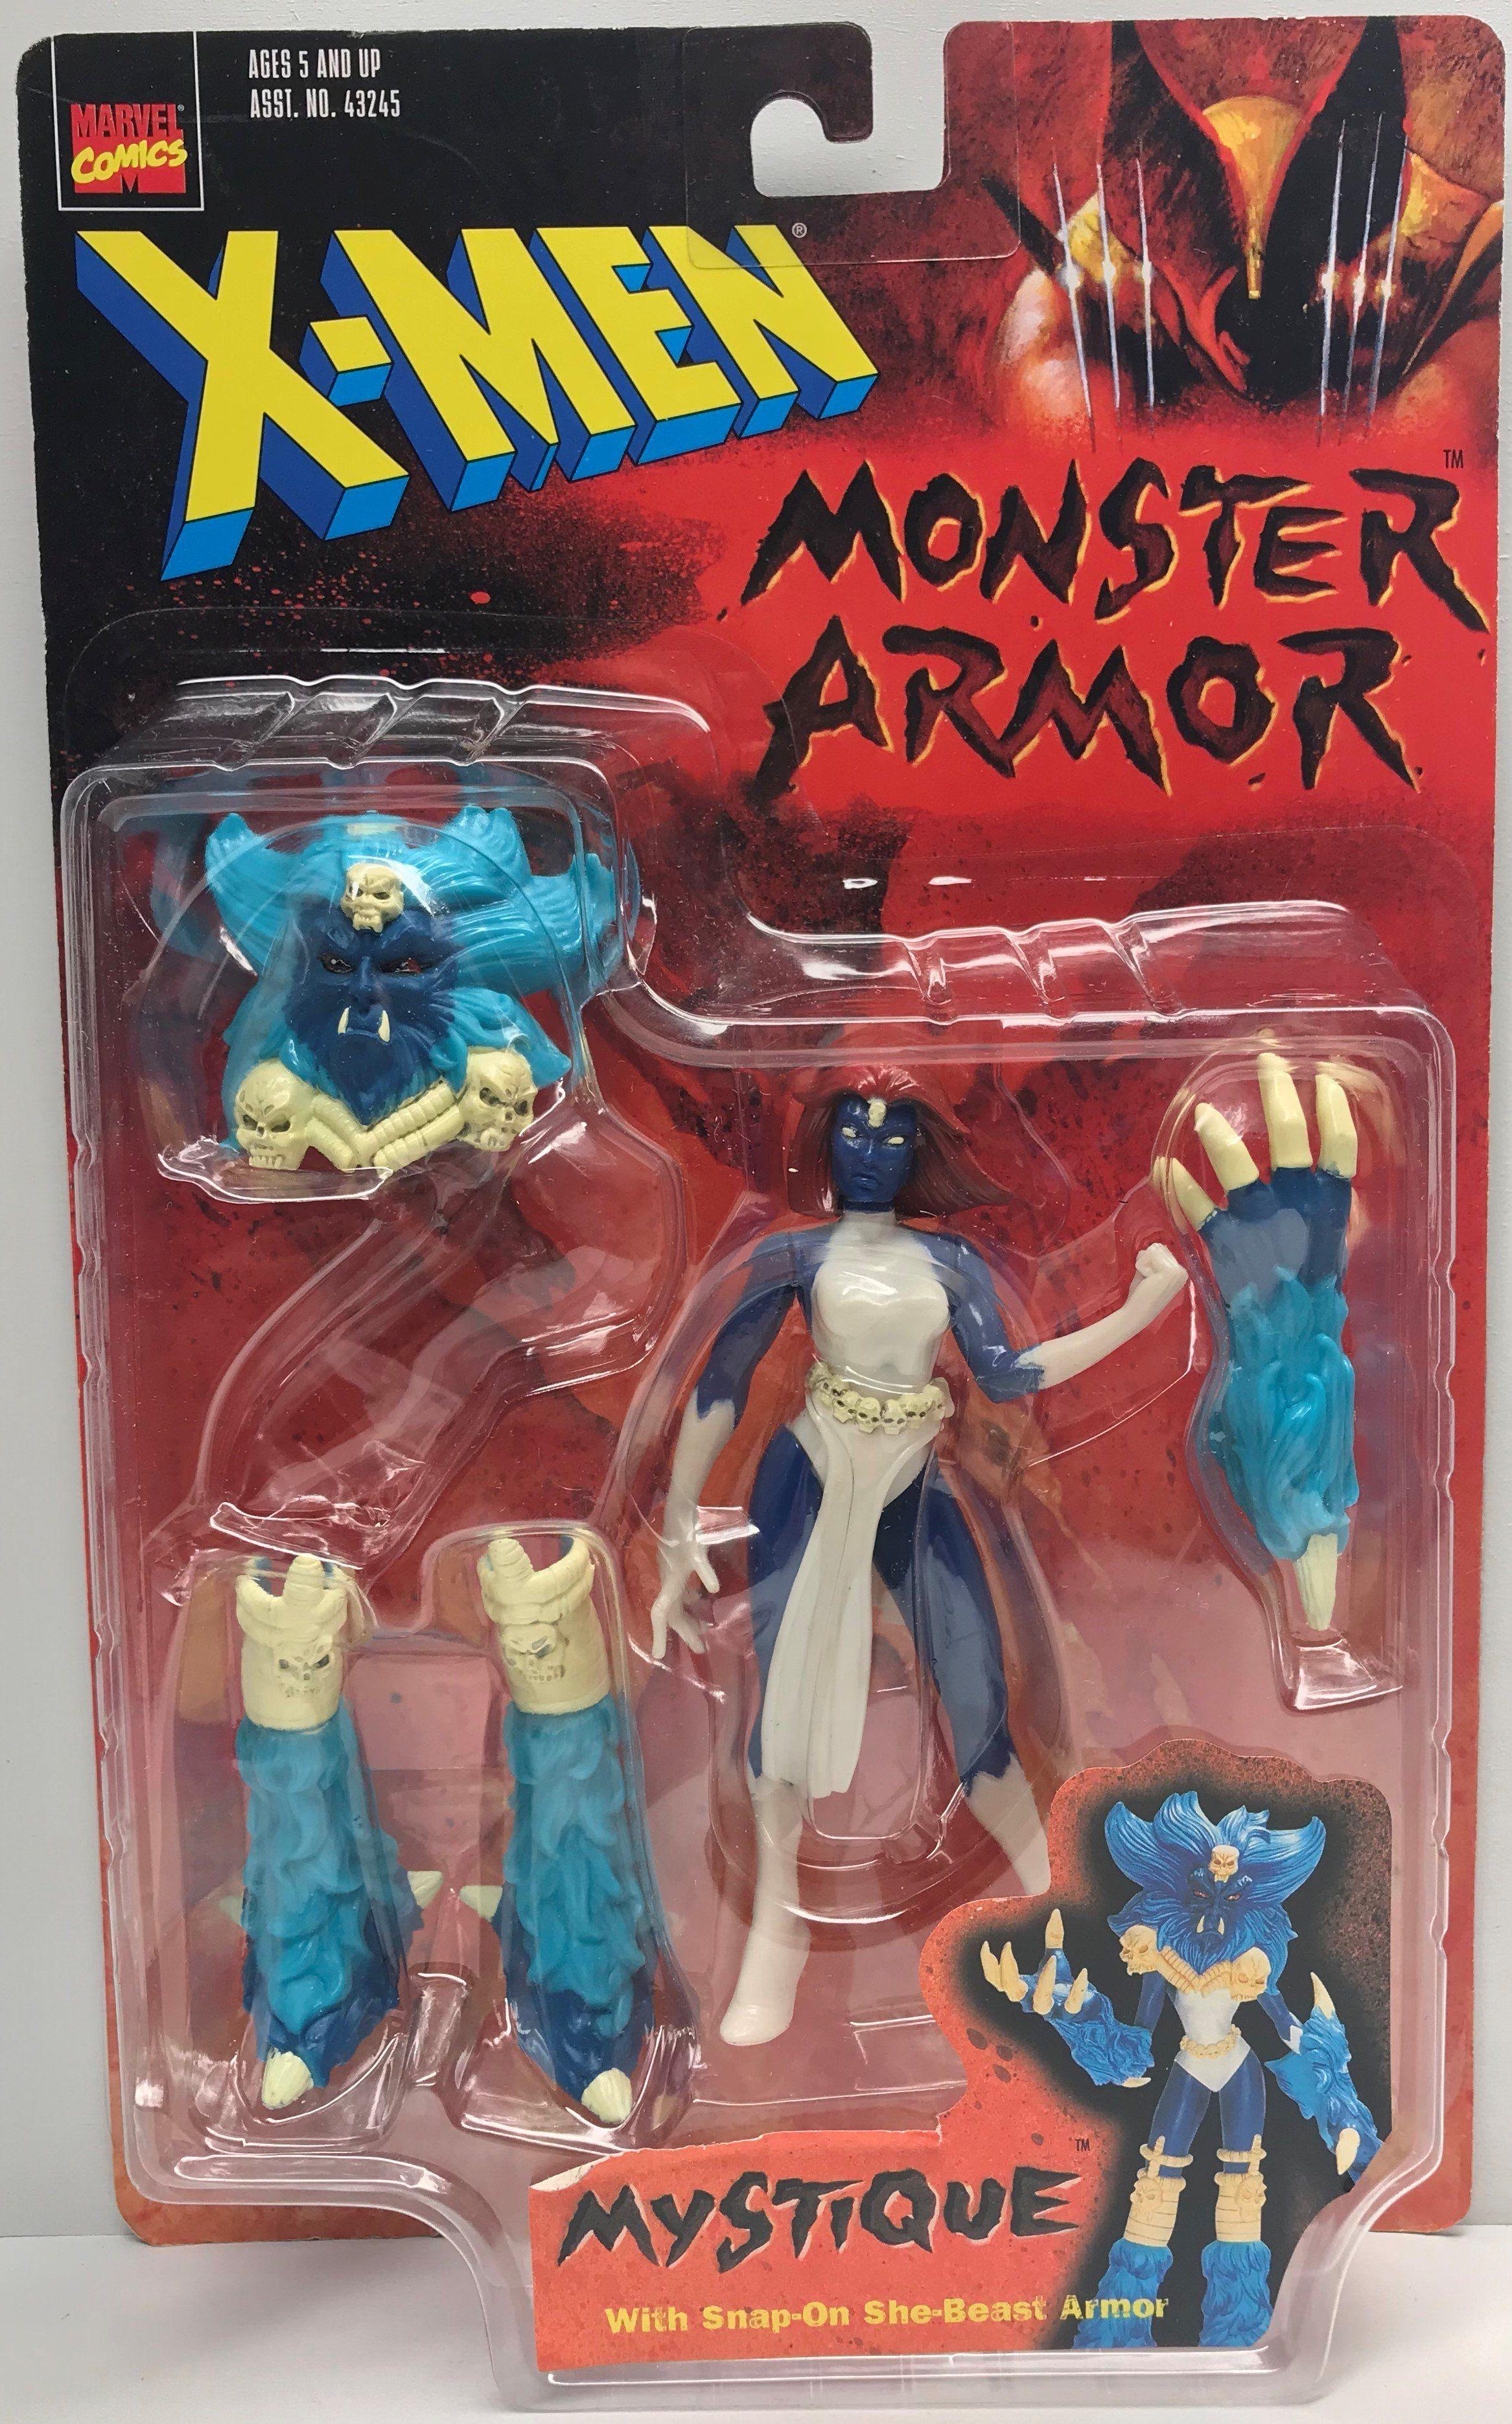 Tas039200 1997 Toy Biz X Men Monster Armor Mystique Action Figure Marvel Toys Superhero Toys Concept Art Characters